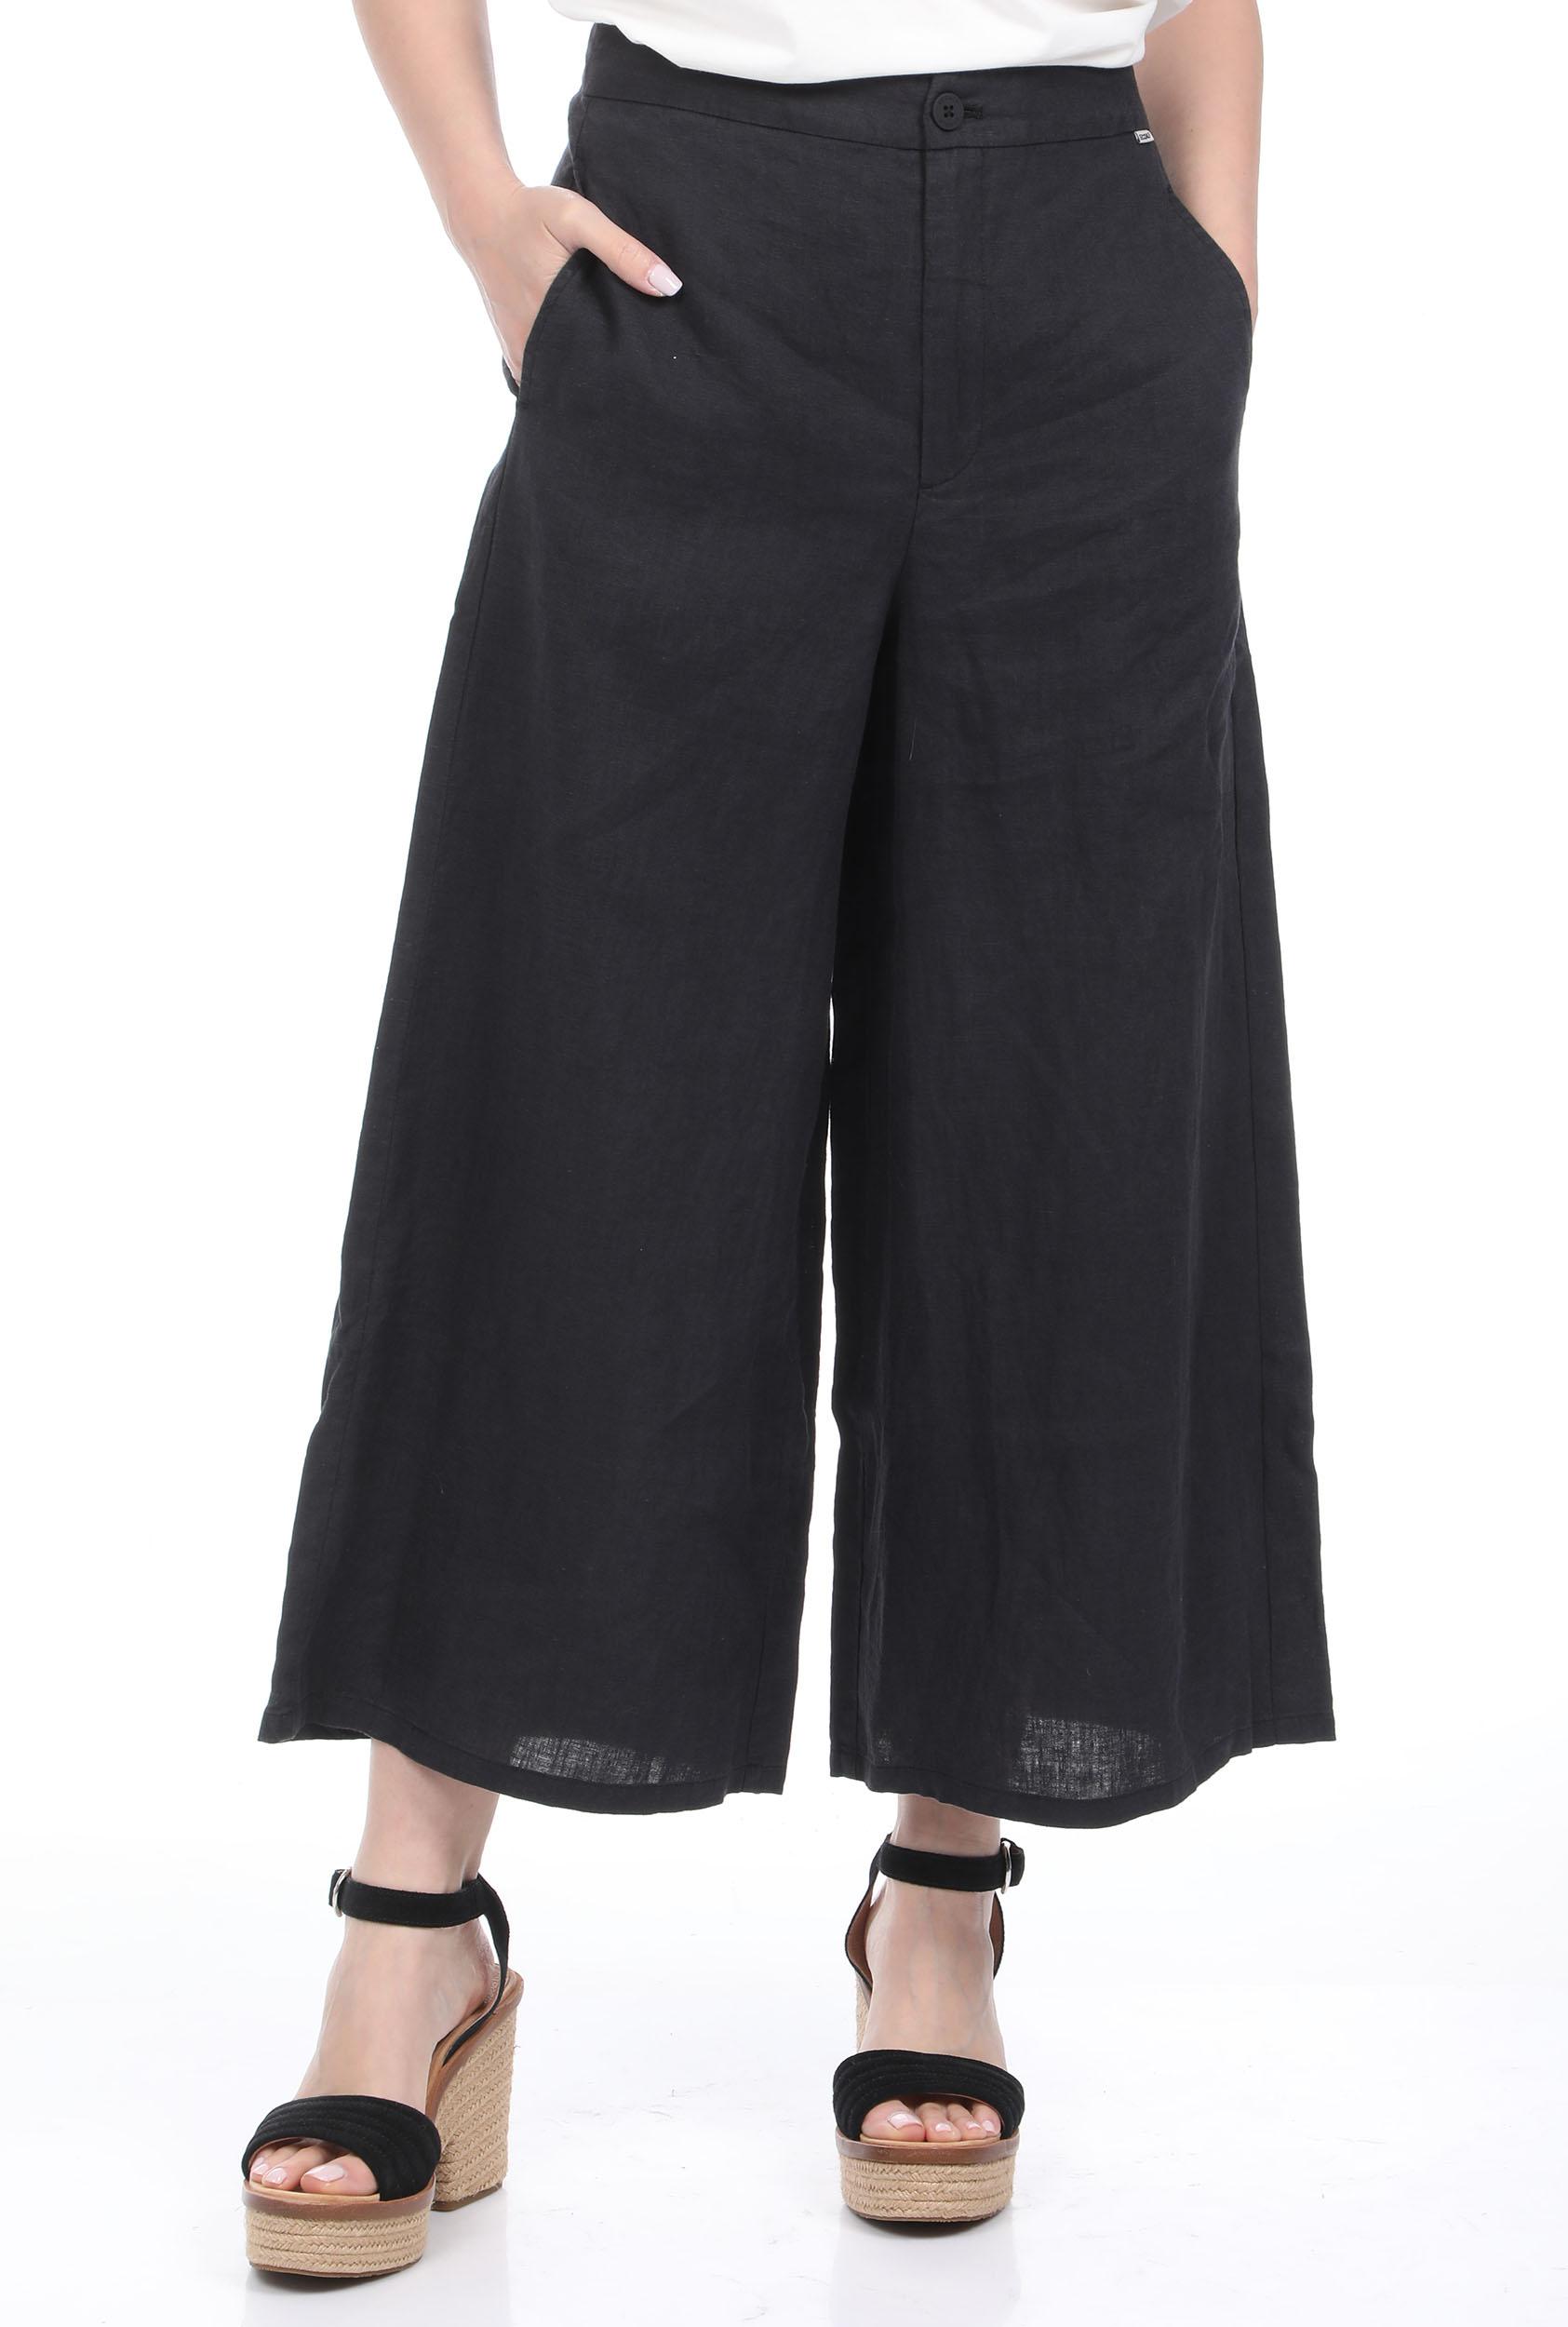 ECOALF - Γυναικεία λινή cropped παντελόνα GRACE AND MILA CYDER γκρι